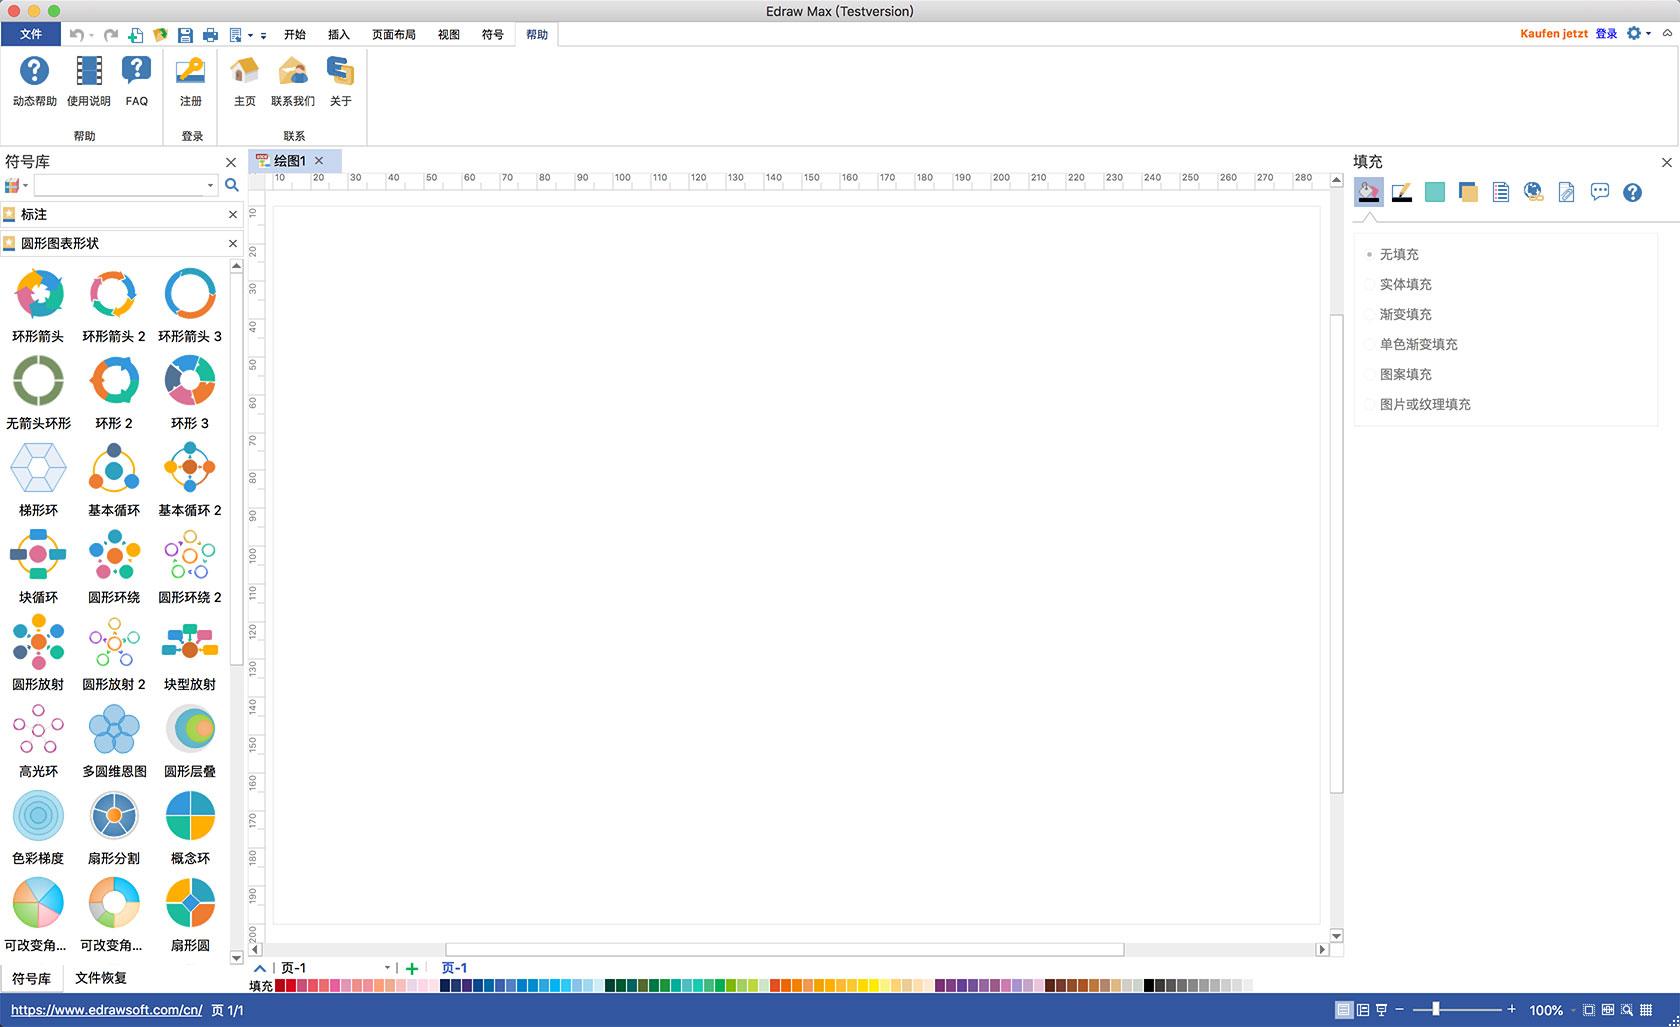 EdrawMax 8.4 - MAC最好的矢量图表绘图工具